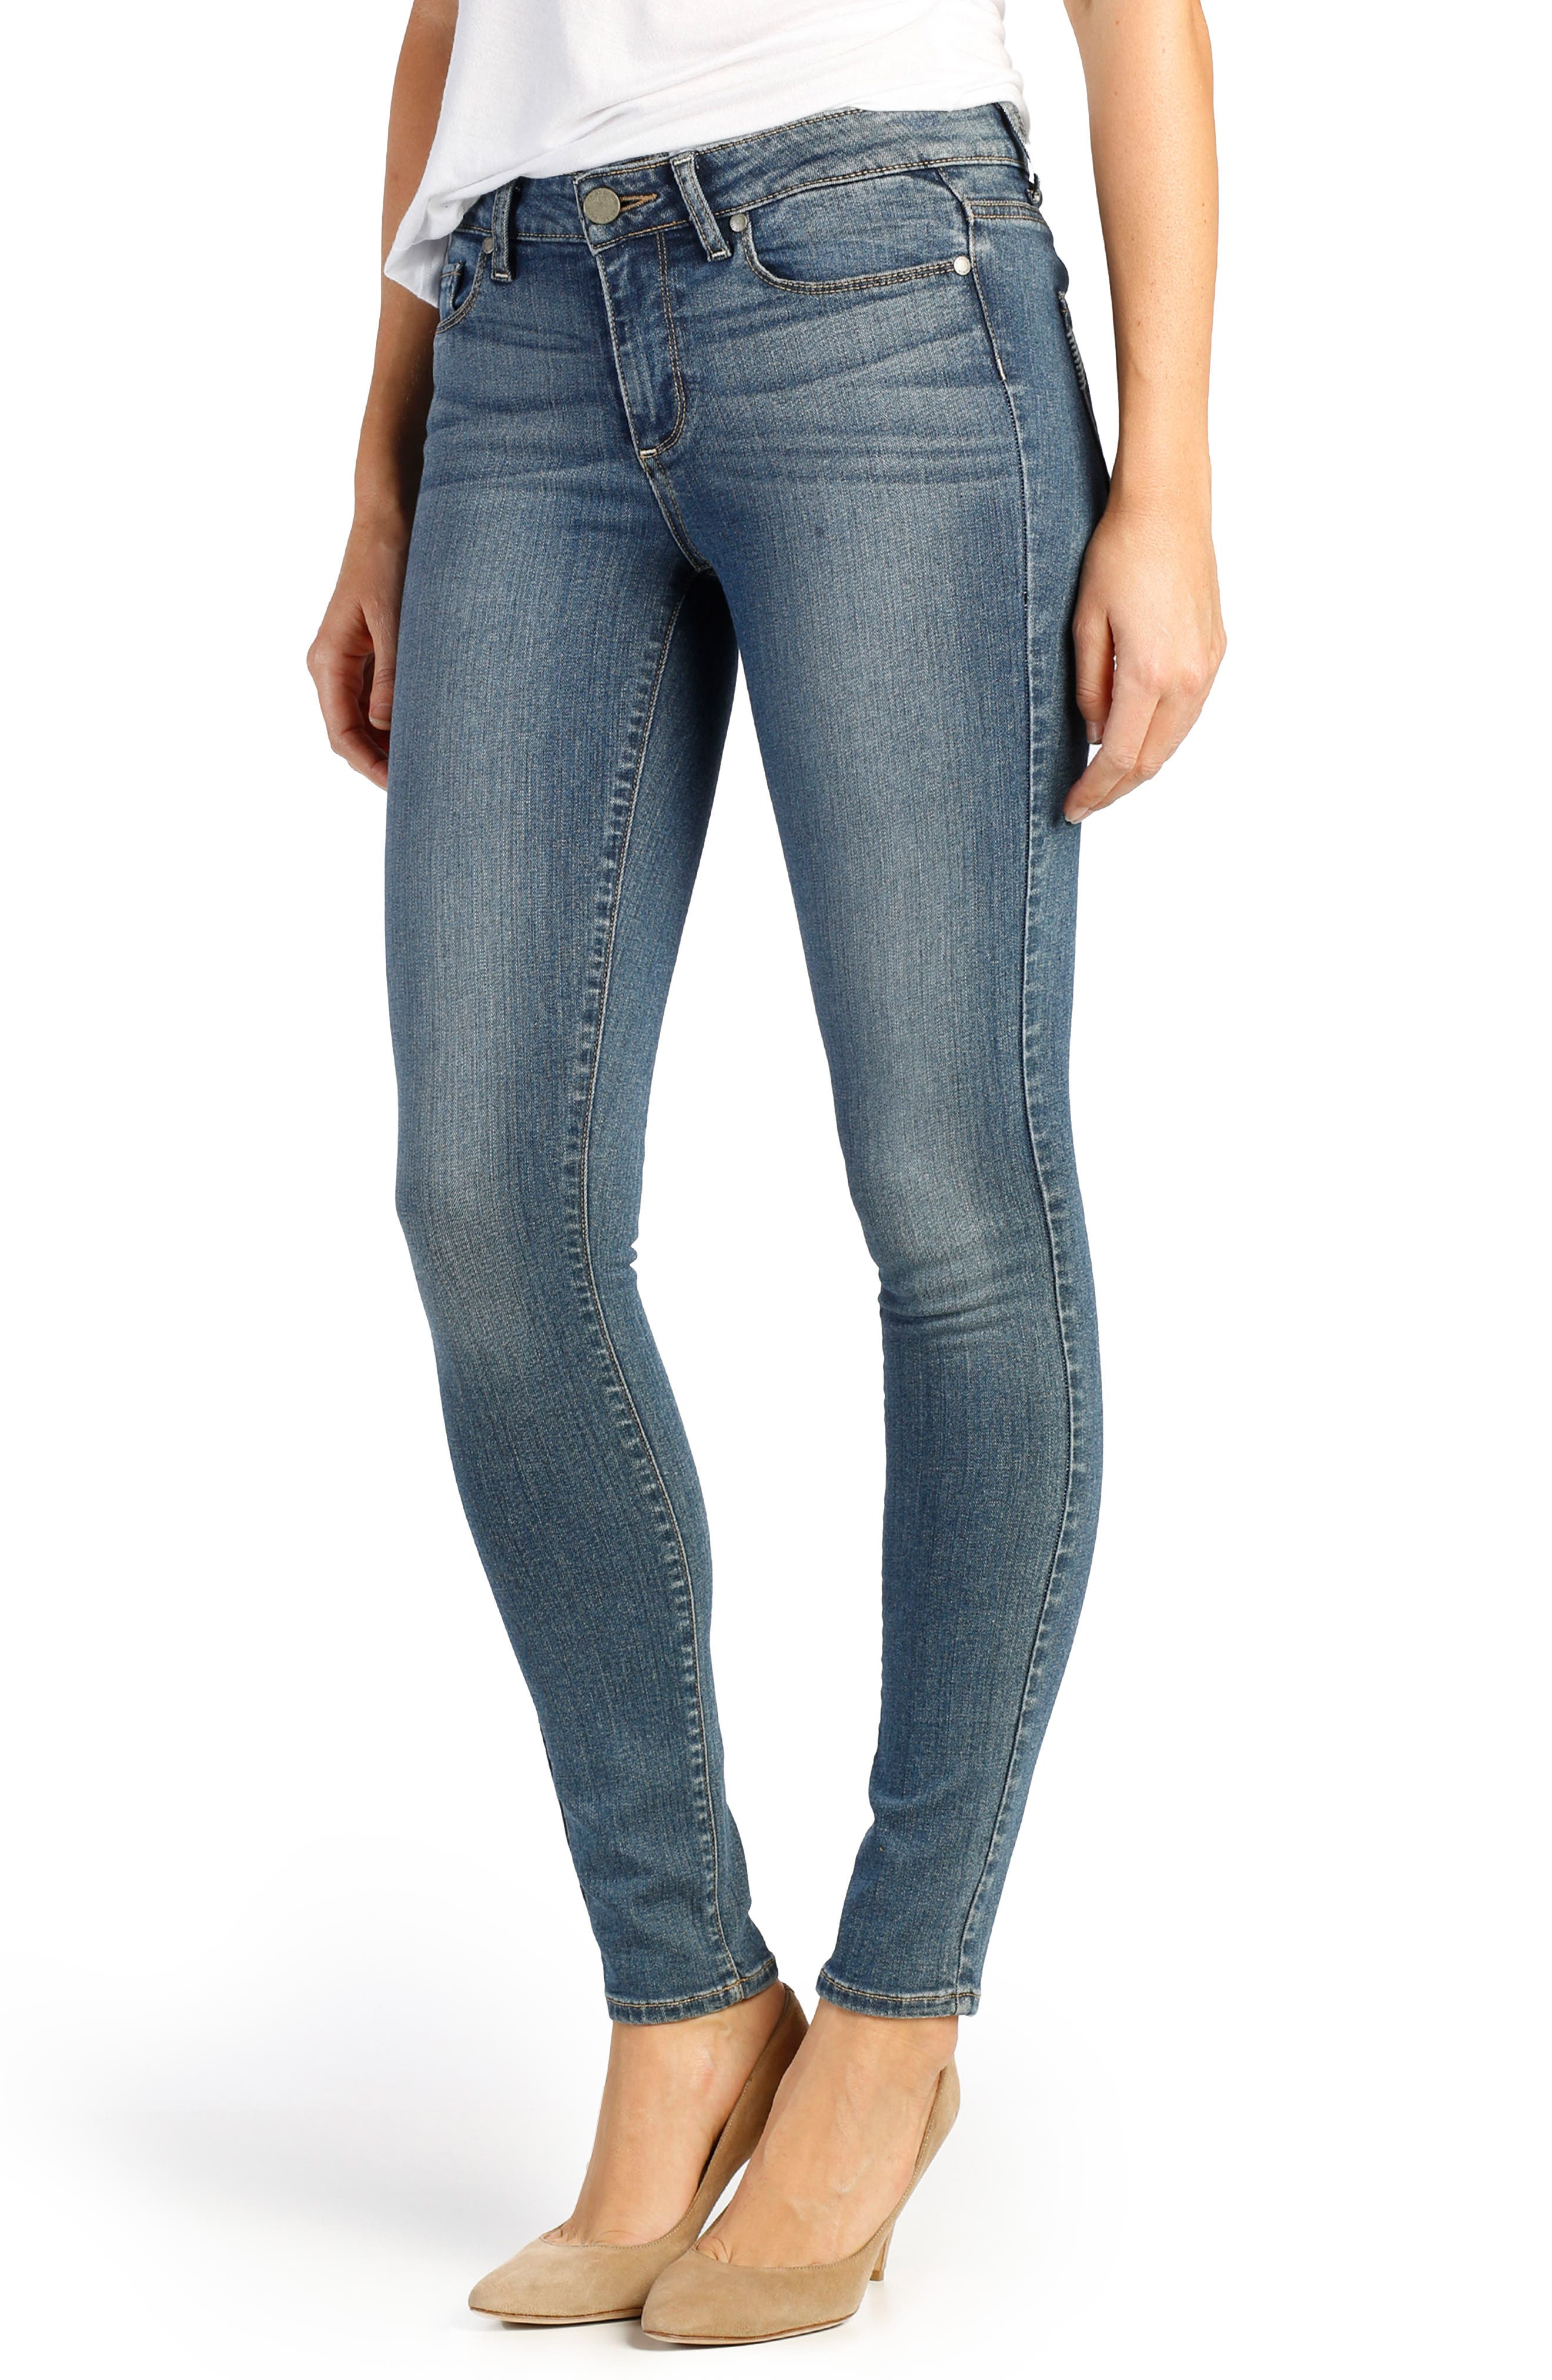 Transcend - Verdugo Ultra Skinny Jeans,                             Main thumbnail 1, color,                             TRISTAN